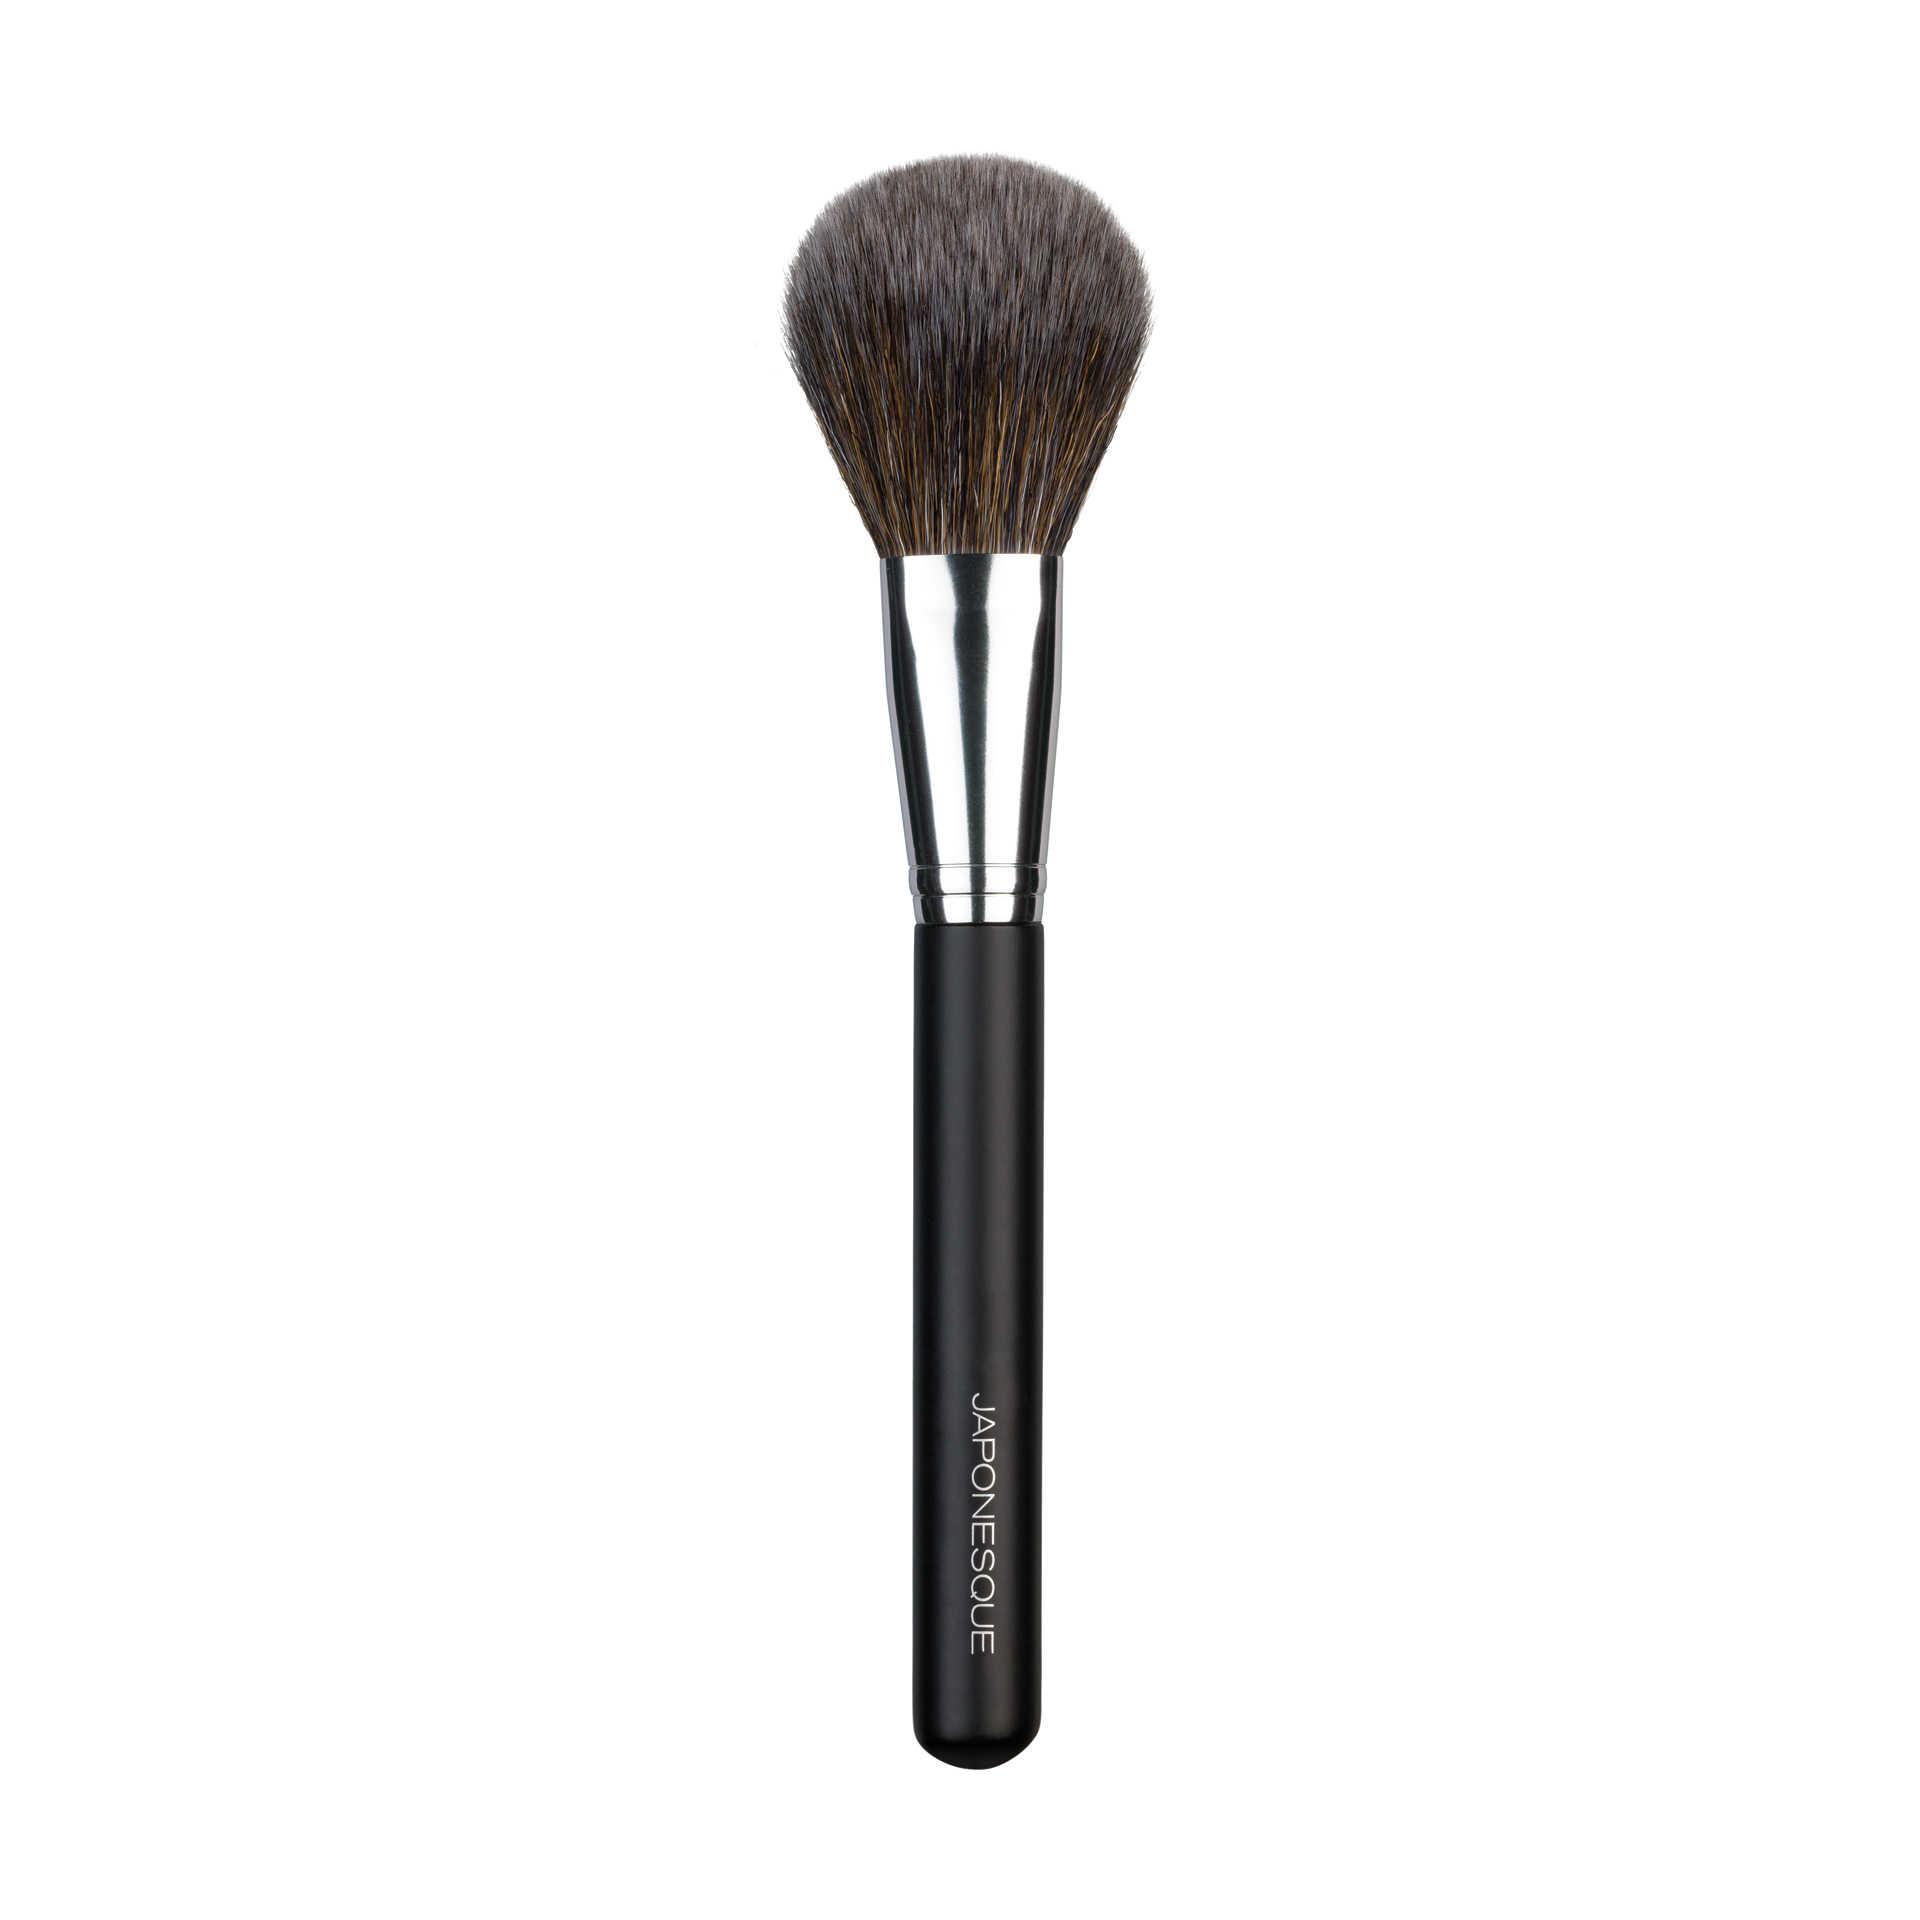 Slanted Powder Brush by japonesque #7